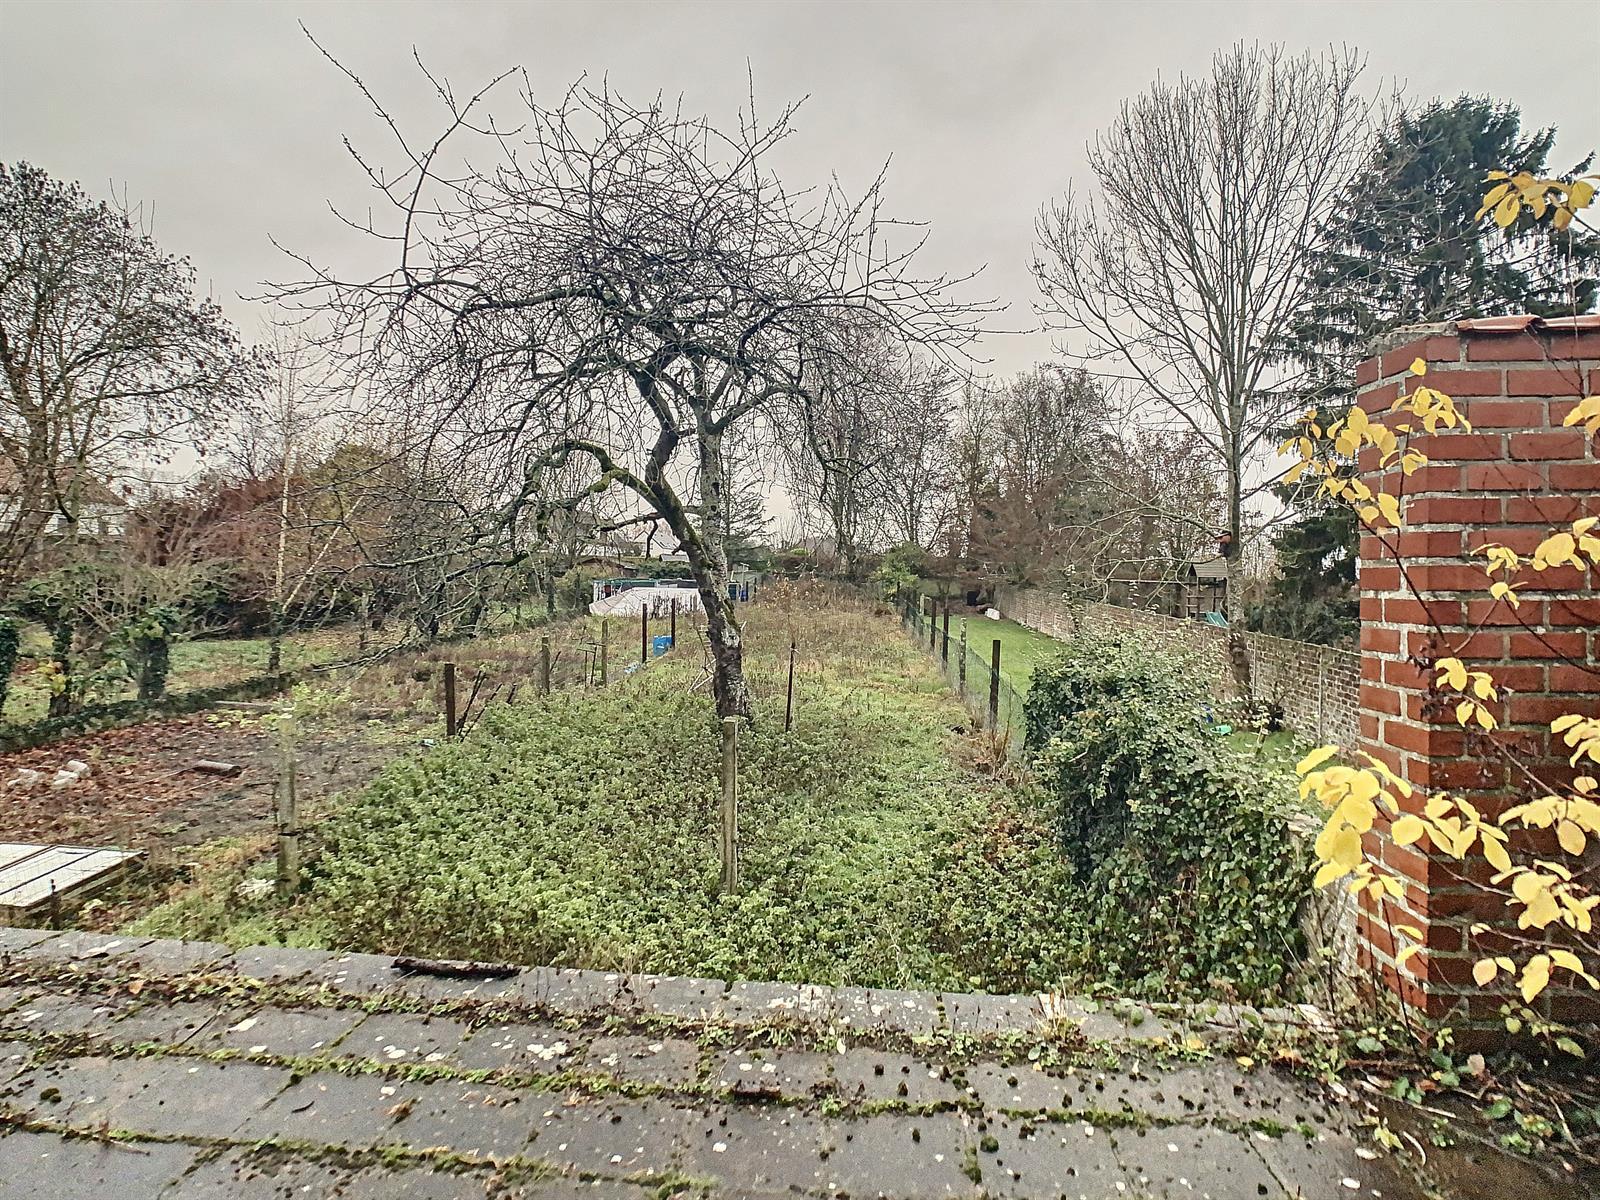 Entrepôt - Villersla-Ville Marbais - #4407525-26